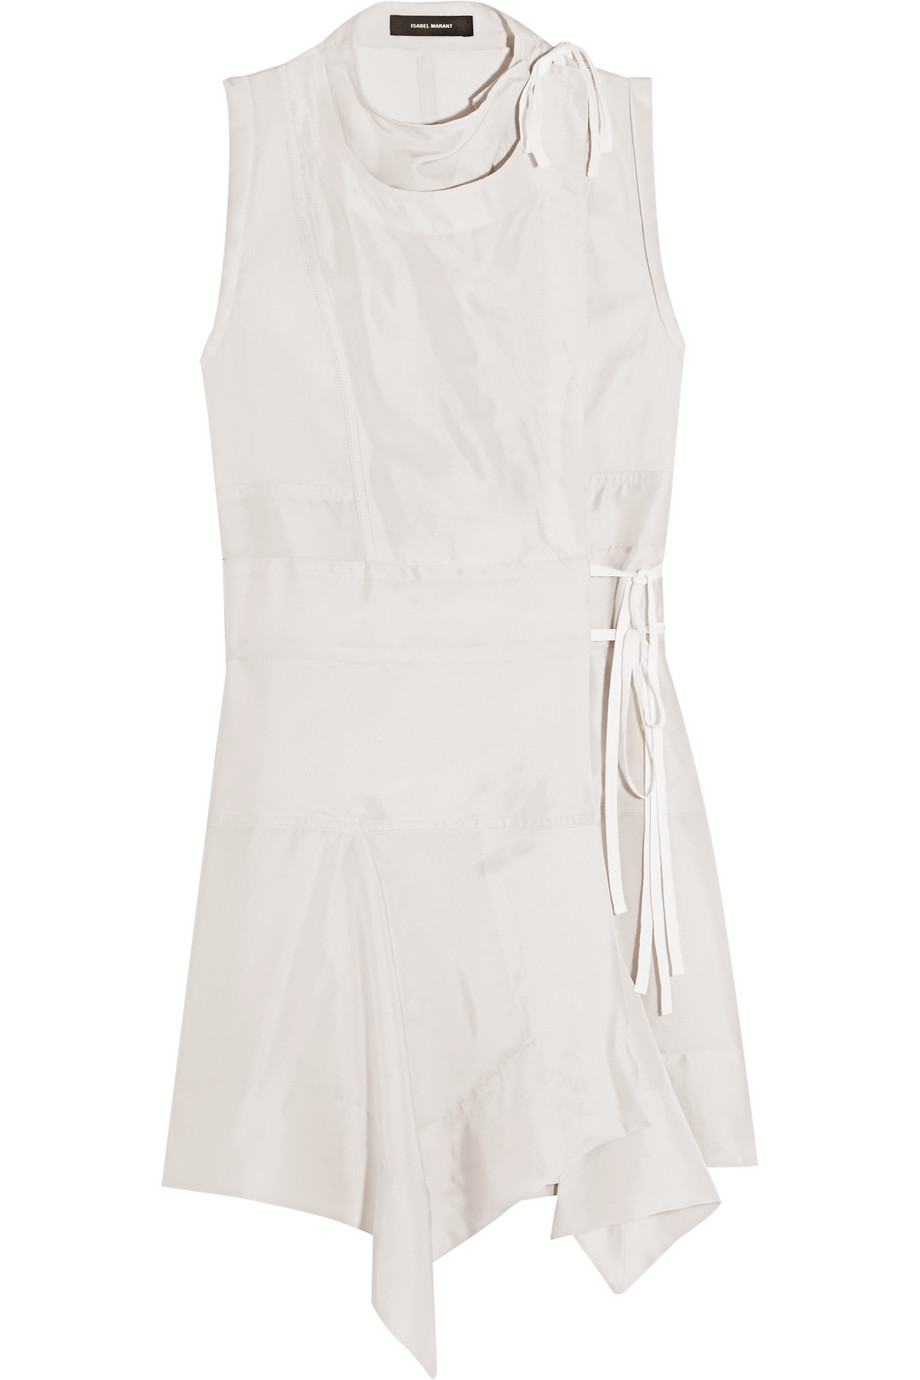 Isabel Marant Lewin Wrap-Effect Silk Mini Dress, Off-White, Women's, Size: 34